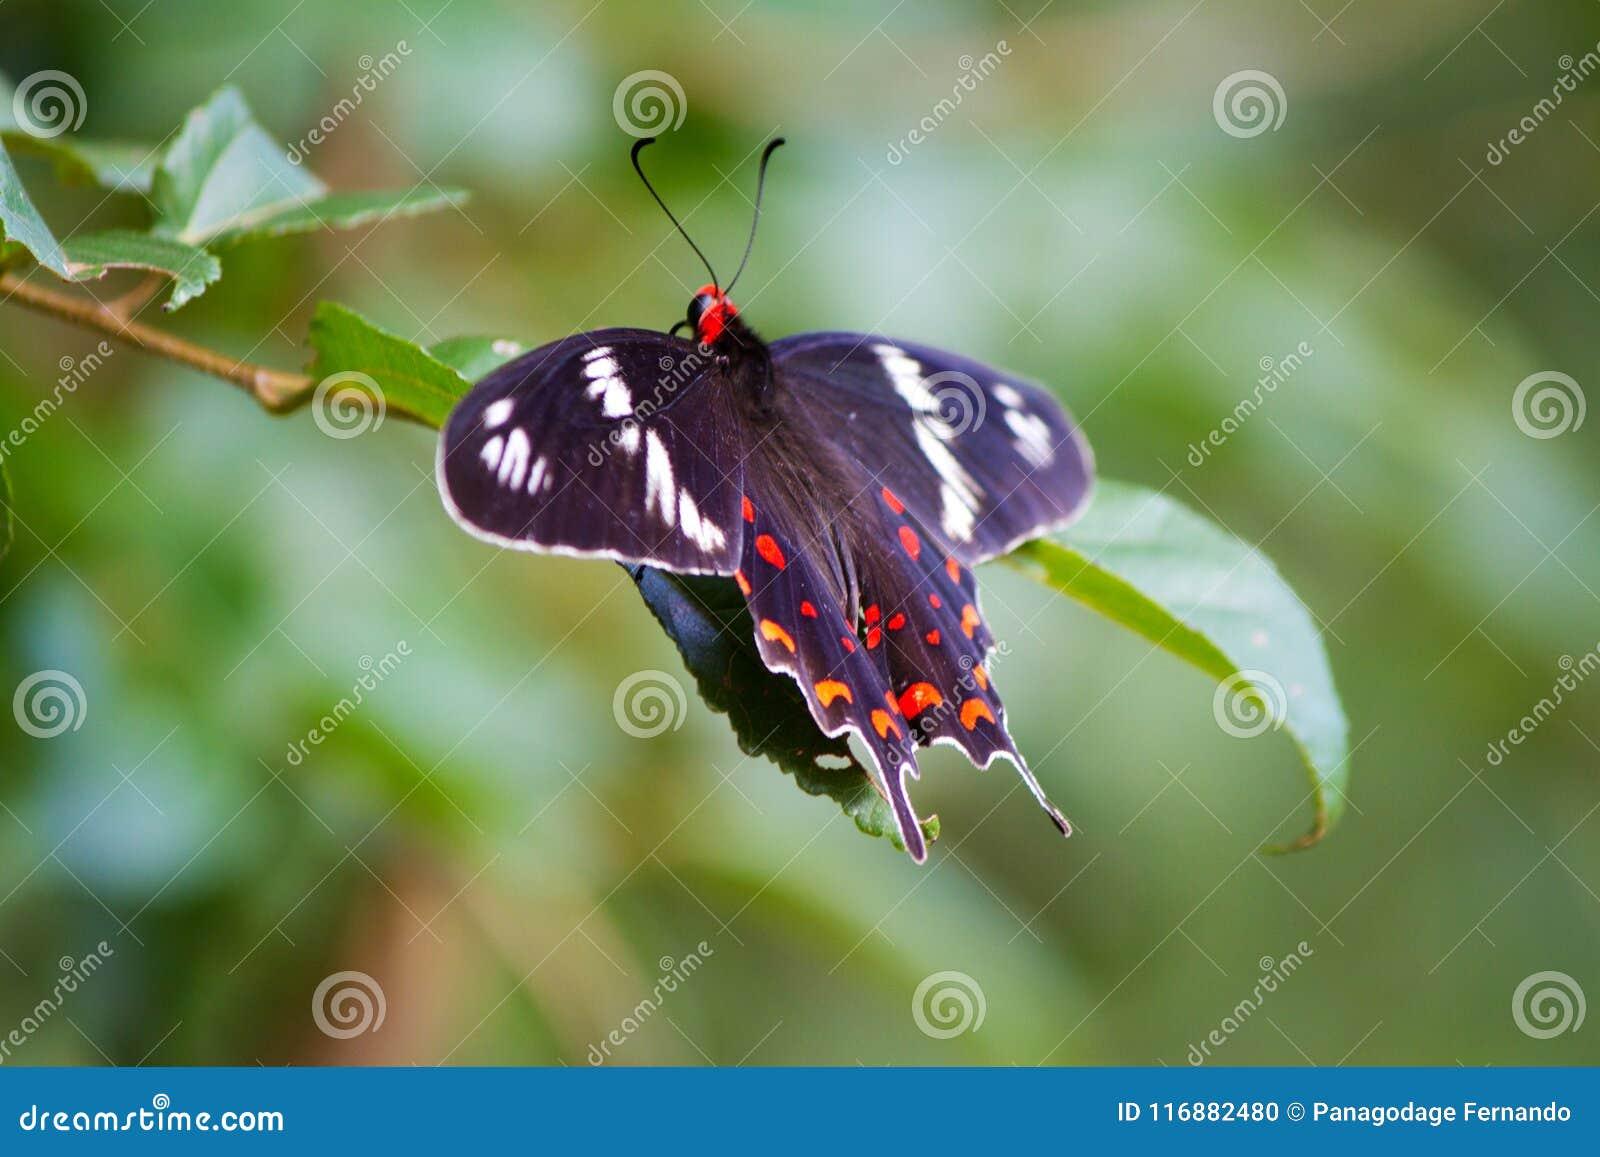 Fjäril karmosinröd ros - Pachliopta tyranniserar i kandalamaen Sri Lanka